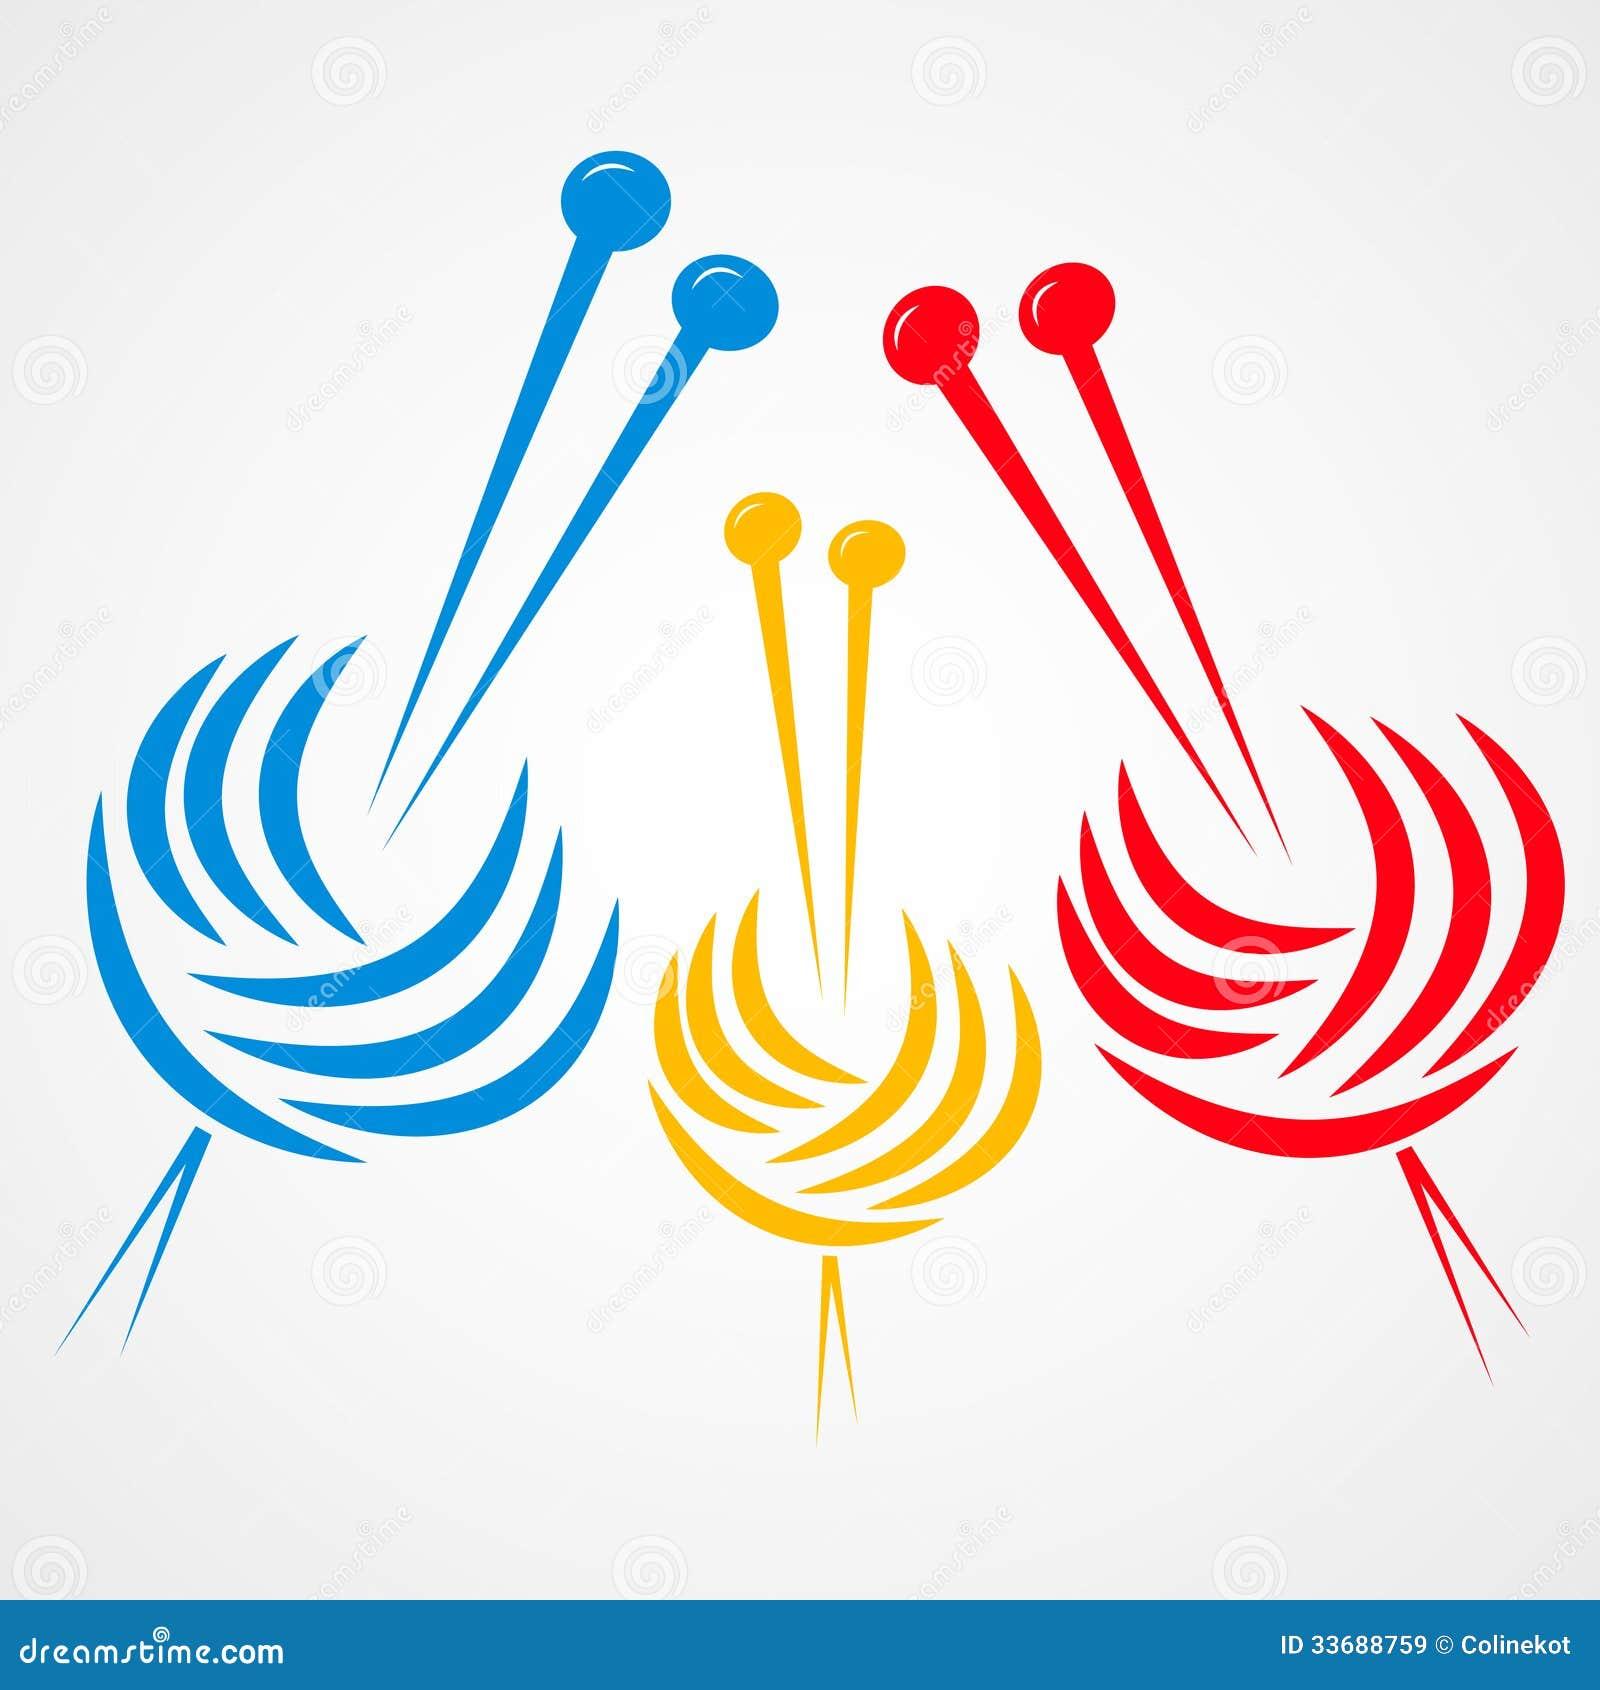 Clipart Knitting Needles : Knitting needles royalty free stock images image